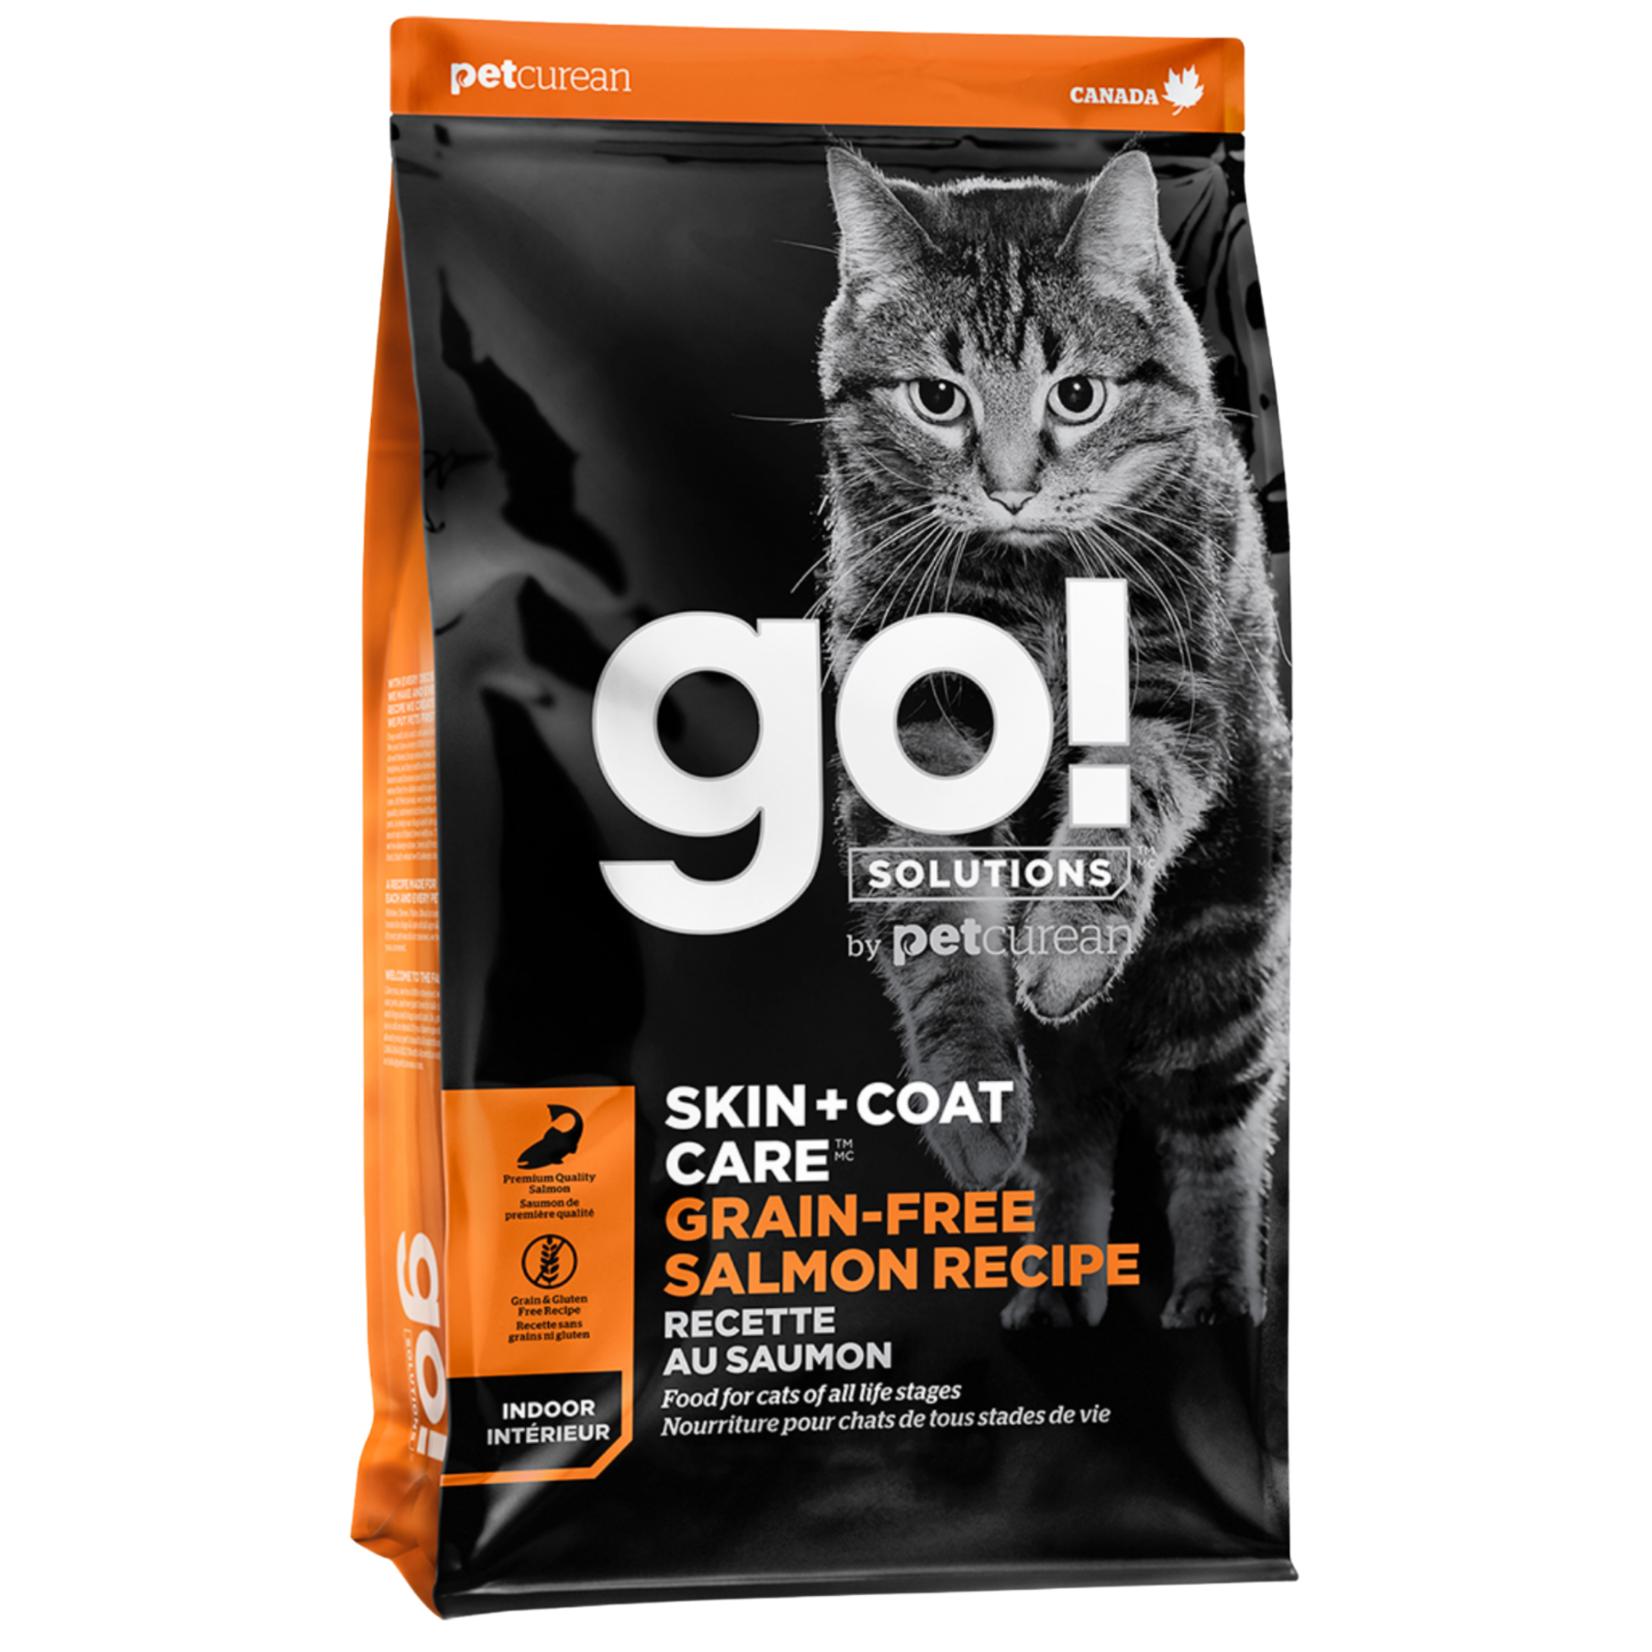 Go! Go! Cat Skin + Coat Care GF Salmon